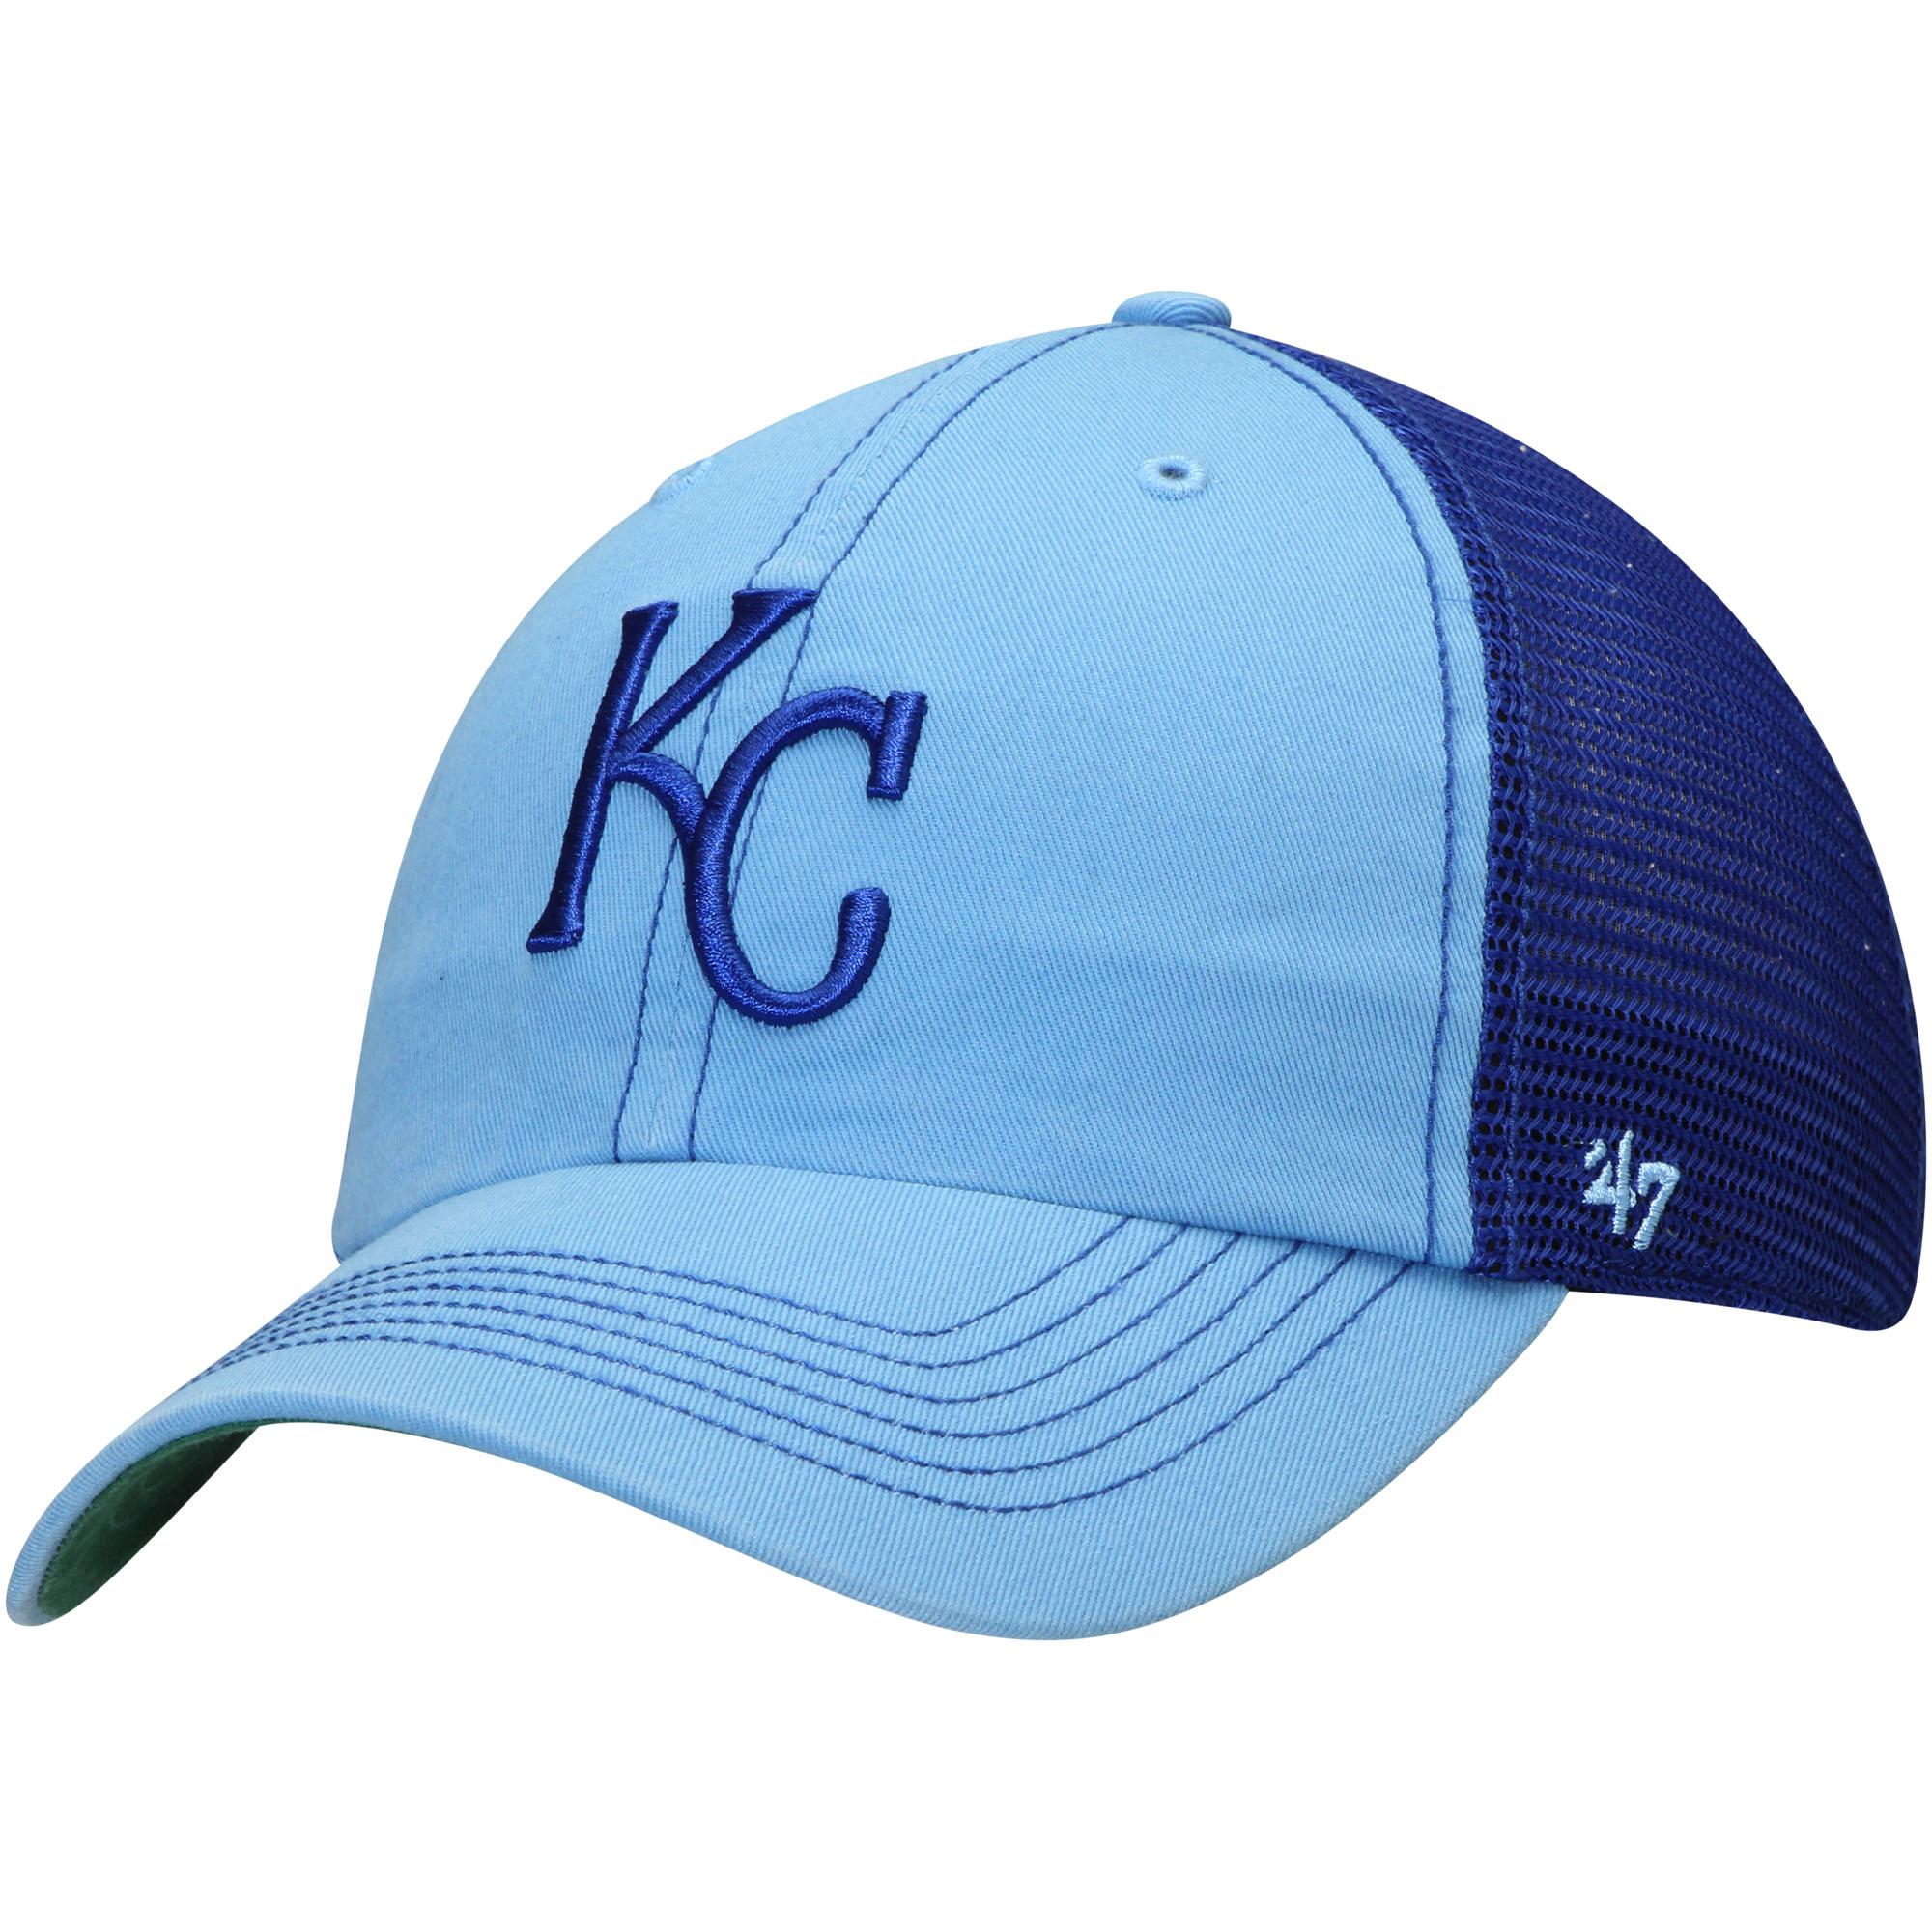 Kansas City Royals '47 Trawler Clean Up Trucker Hat - Light Blue - OSFA